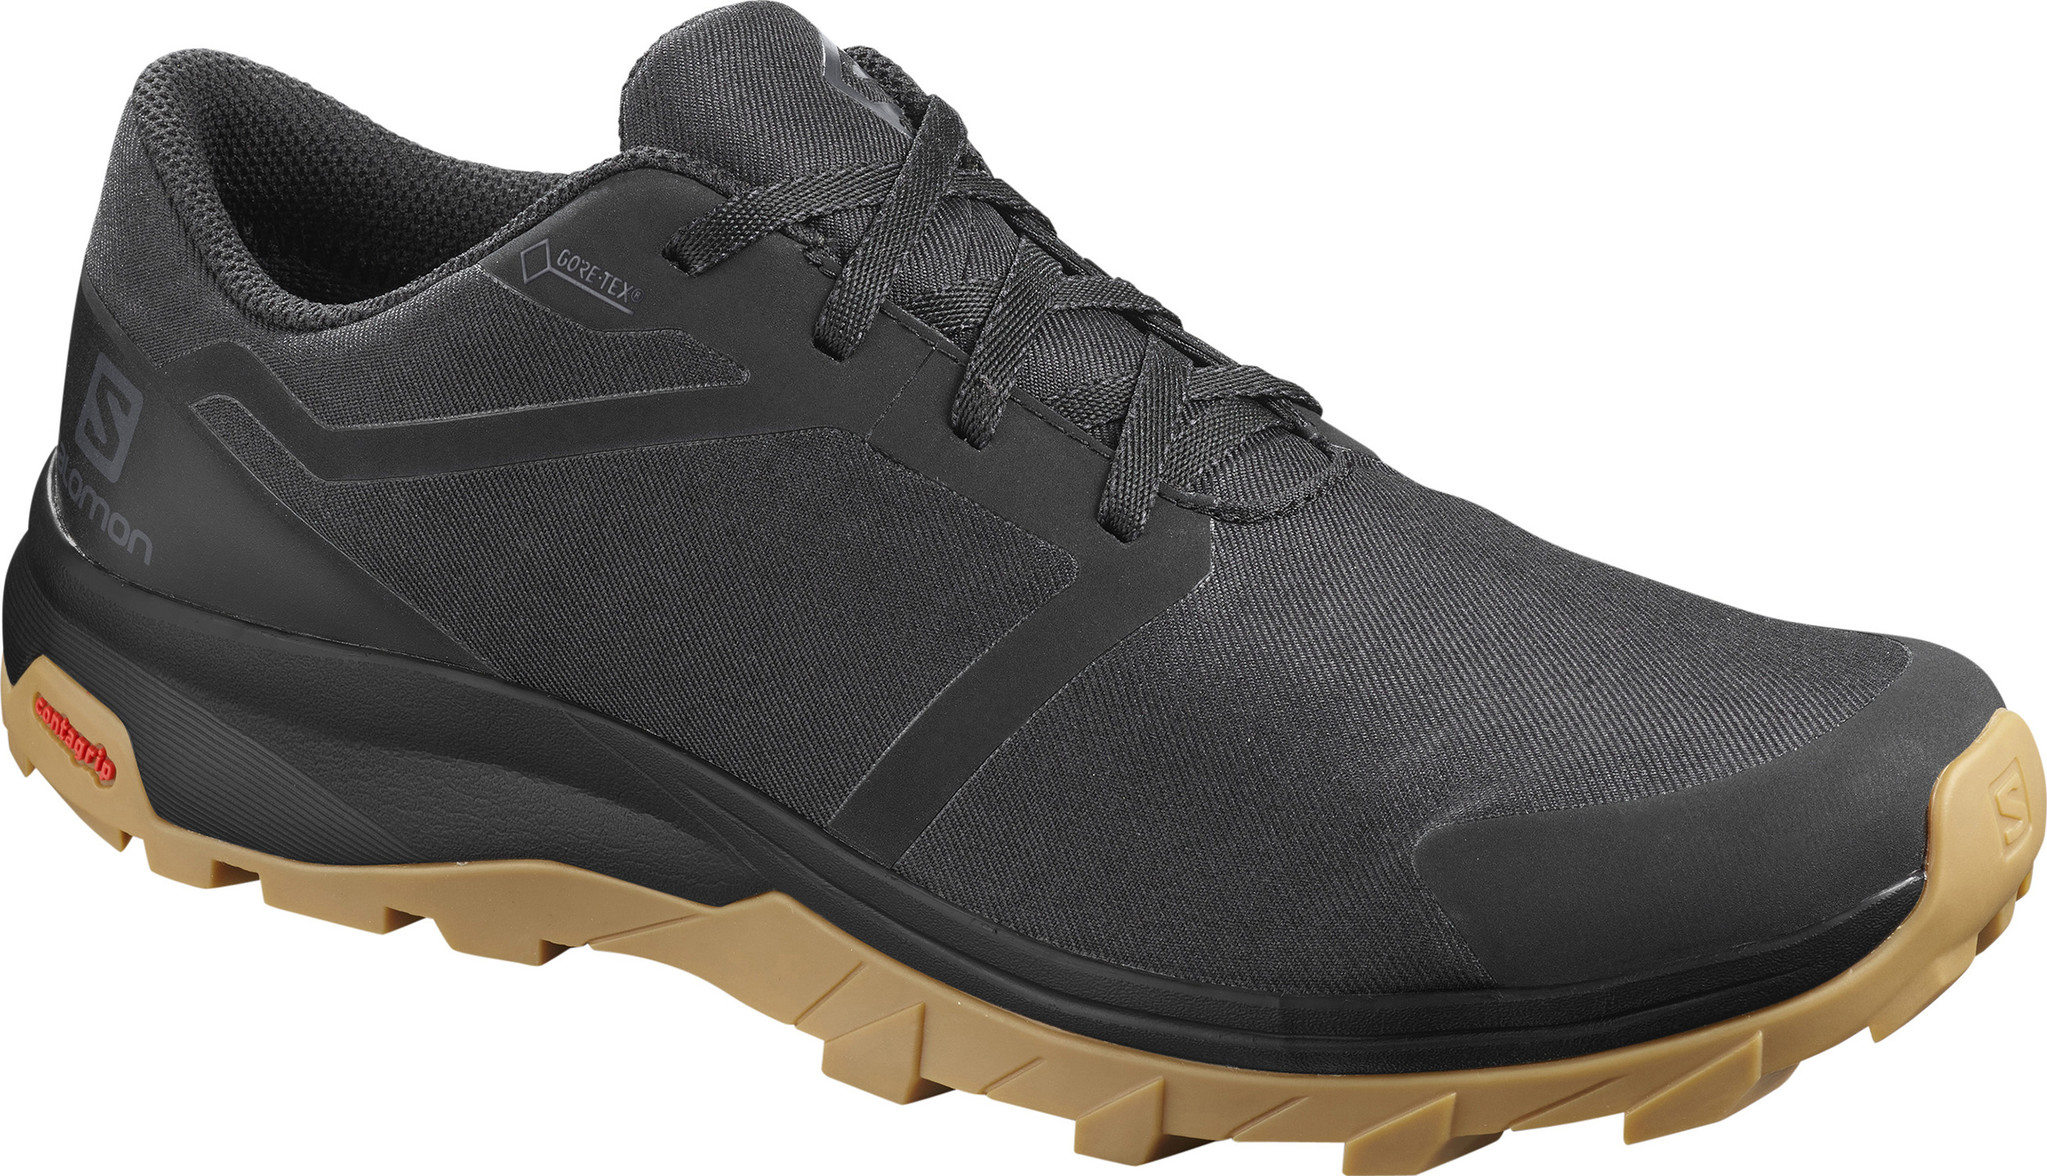 Salomon Outbound GTX Men's Hiking Shoe